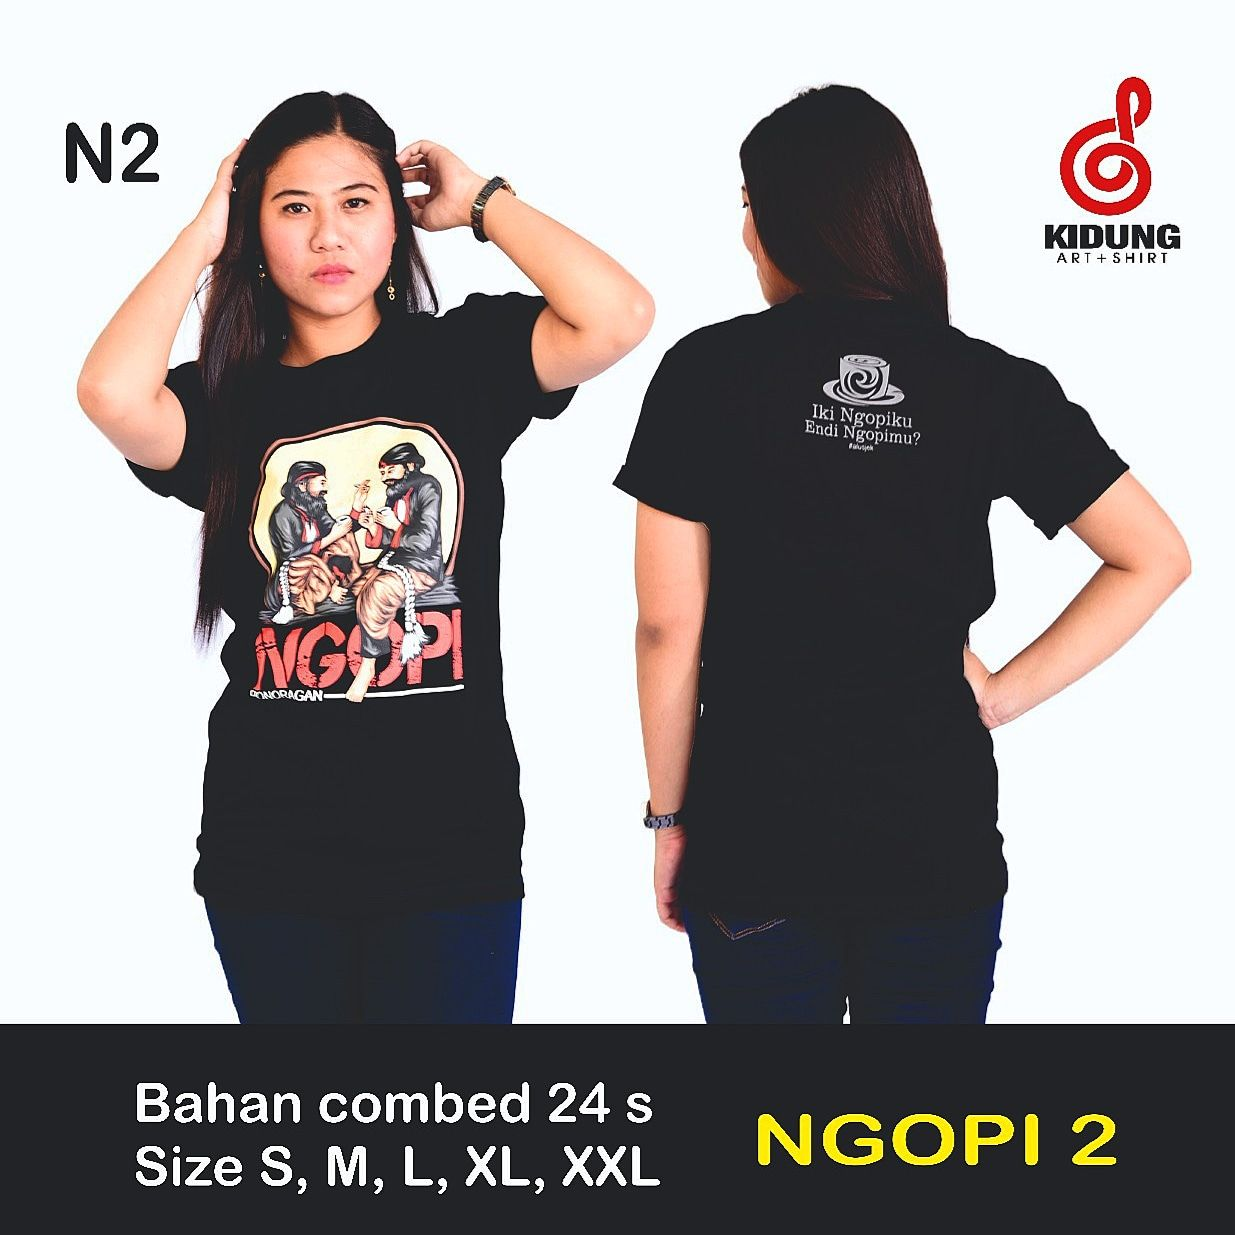 Kidung Clothing Ngopi2